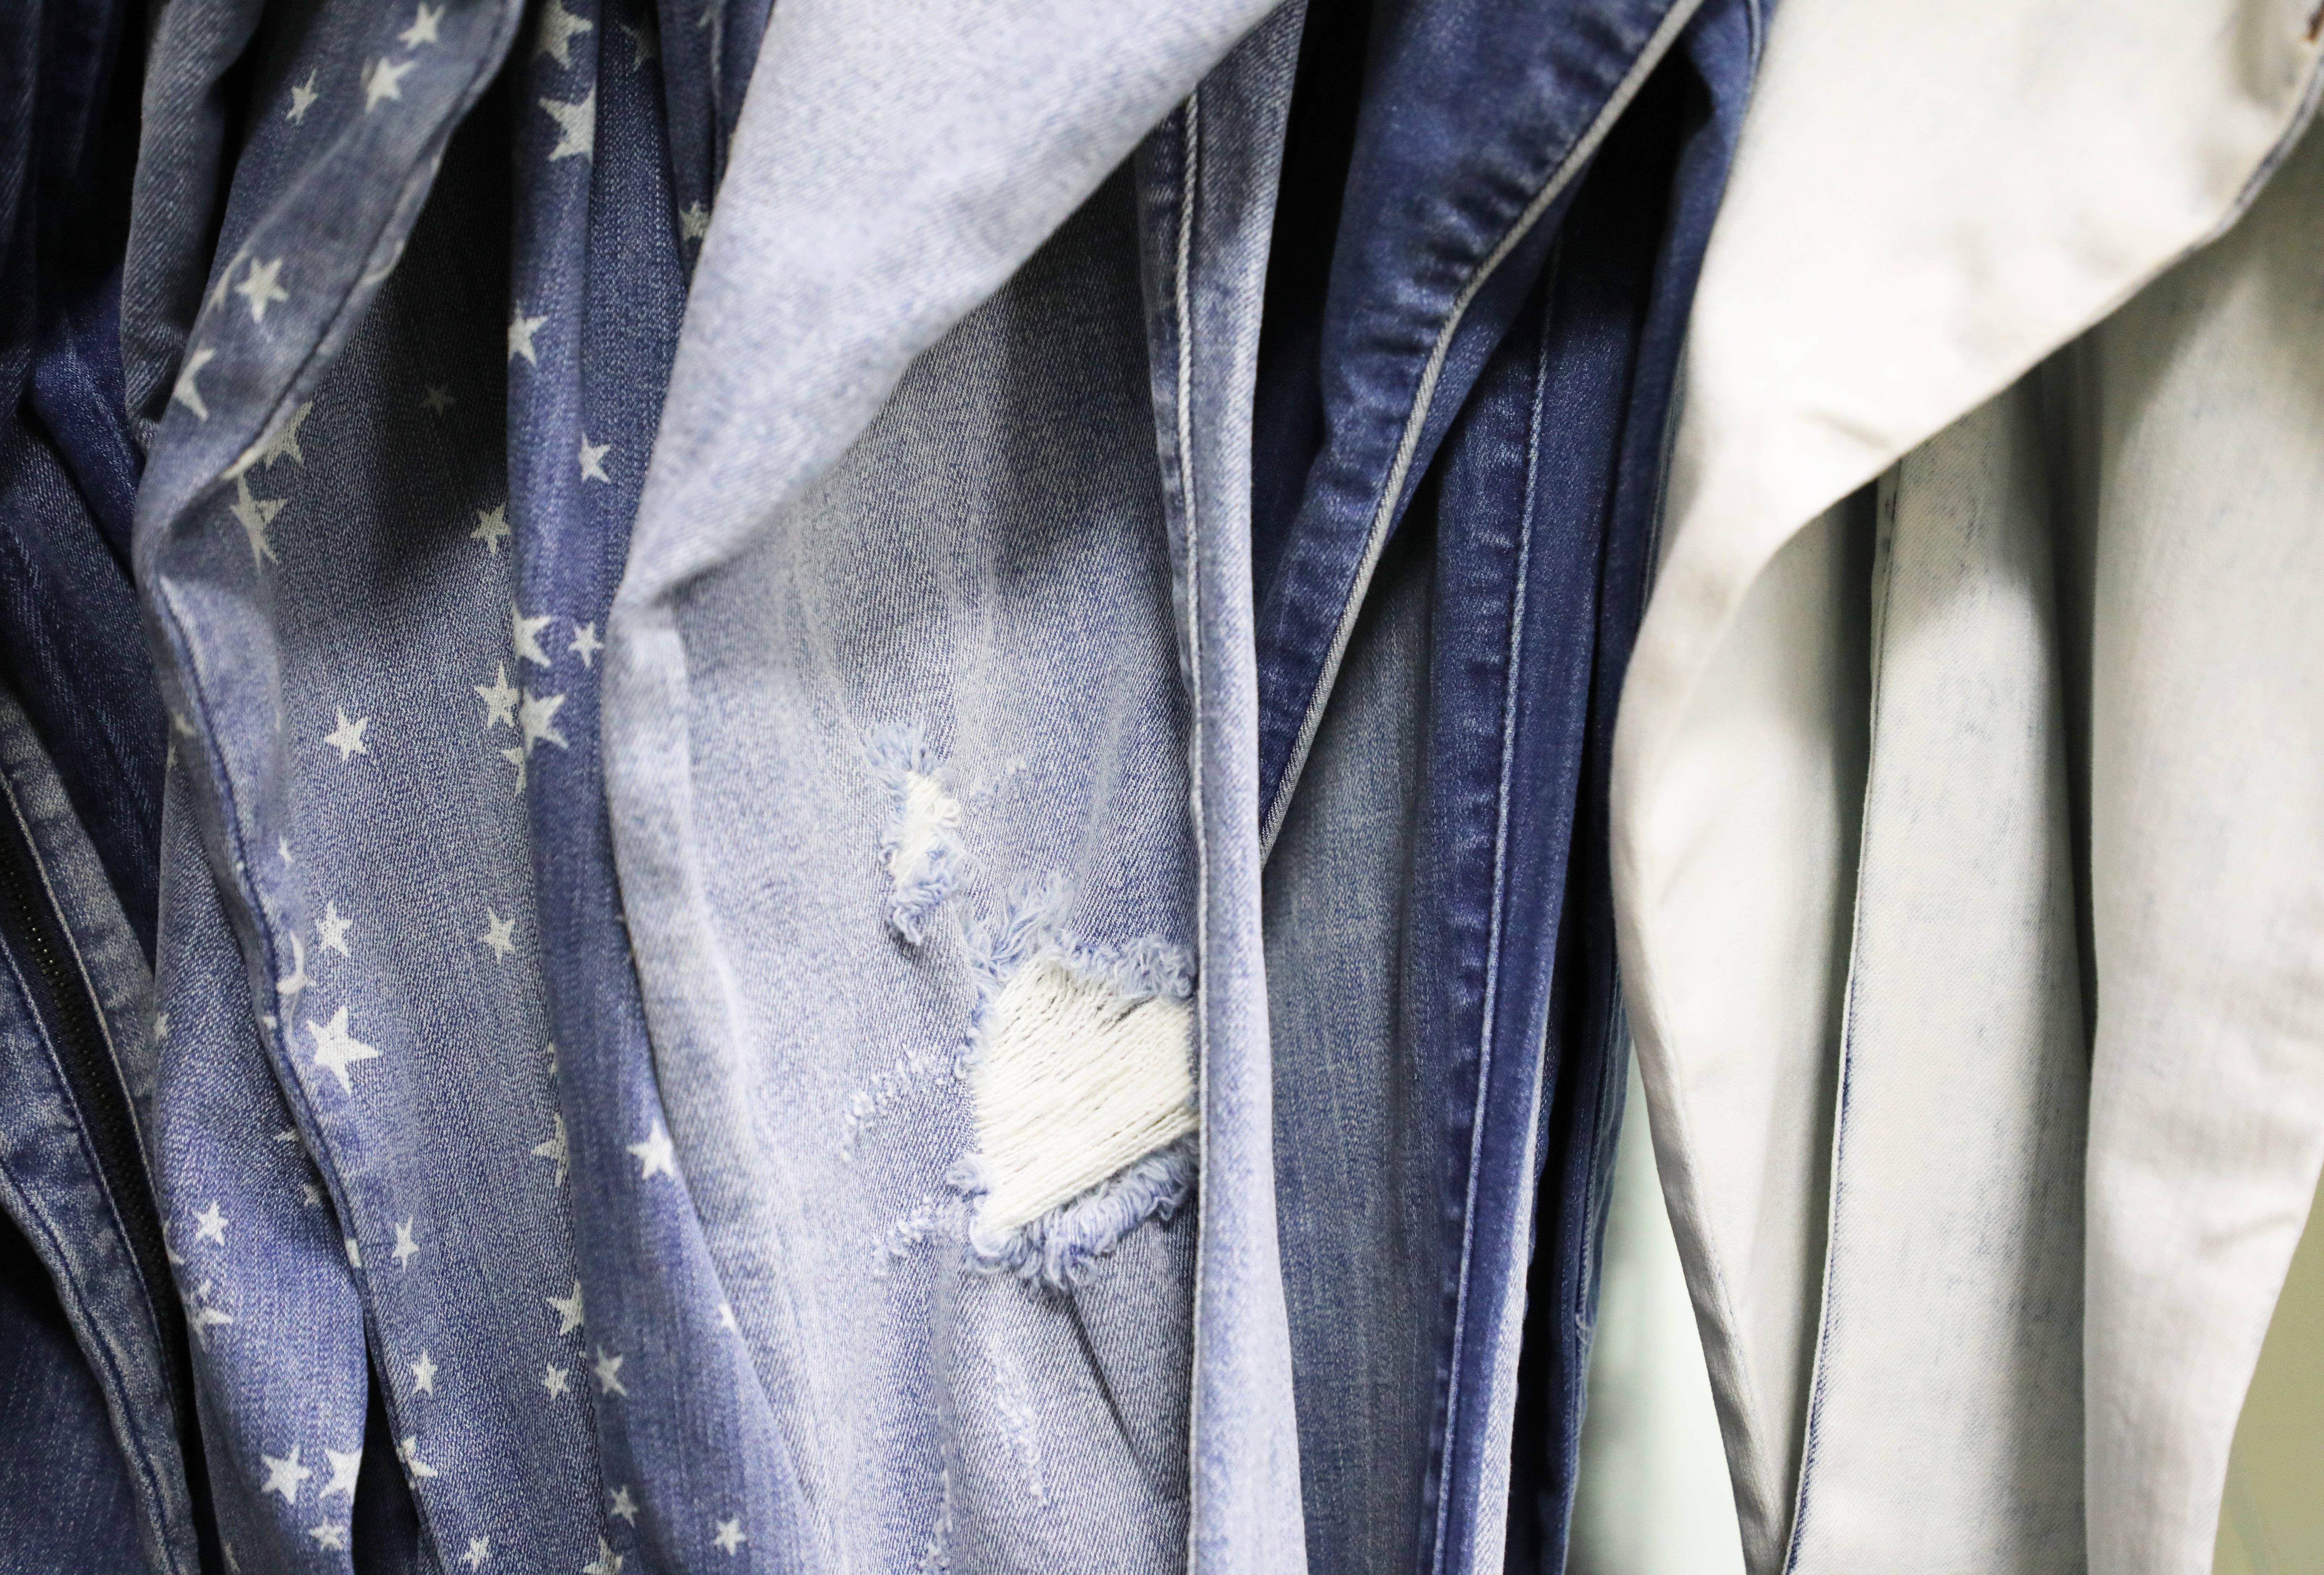 Selection of denim jeans hanging on rack